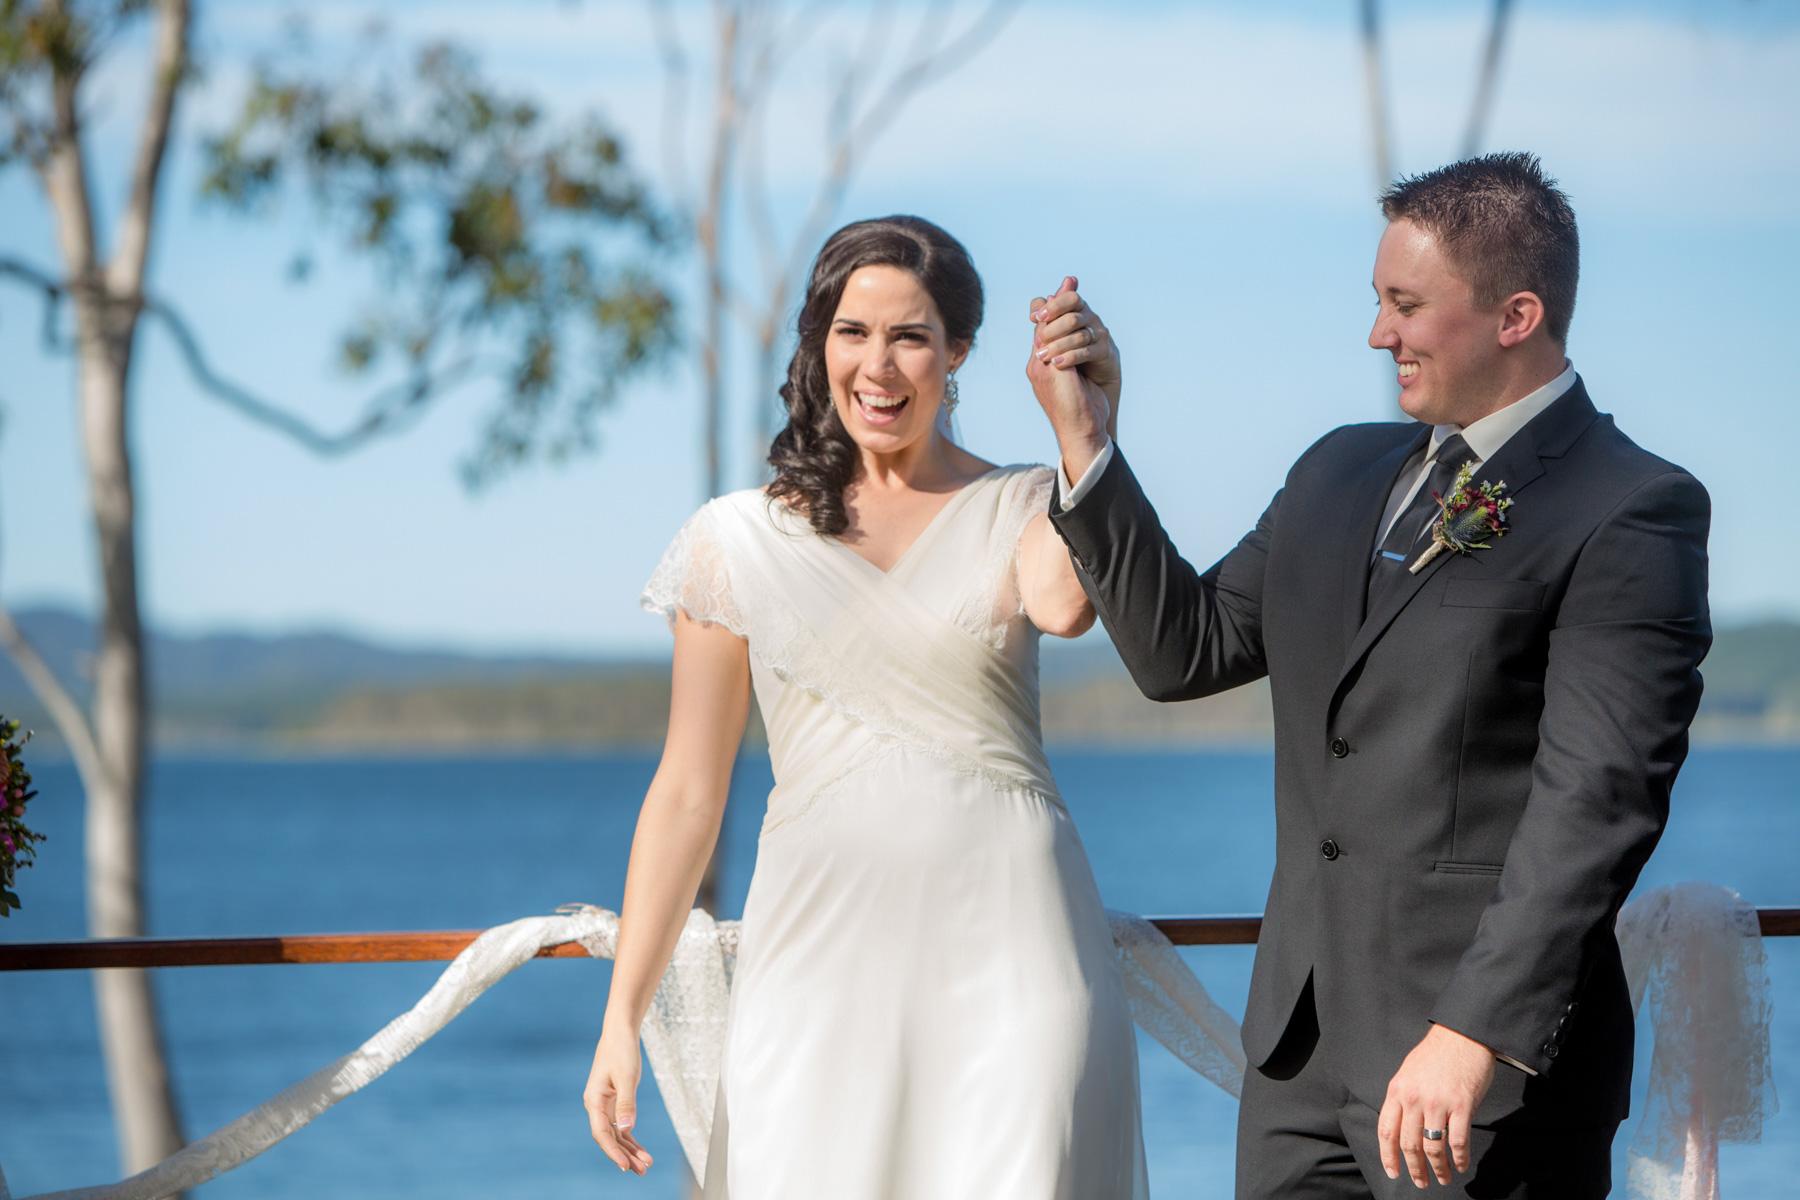 Jenna_Ray_Rustic-Wedding_025